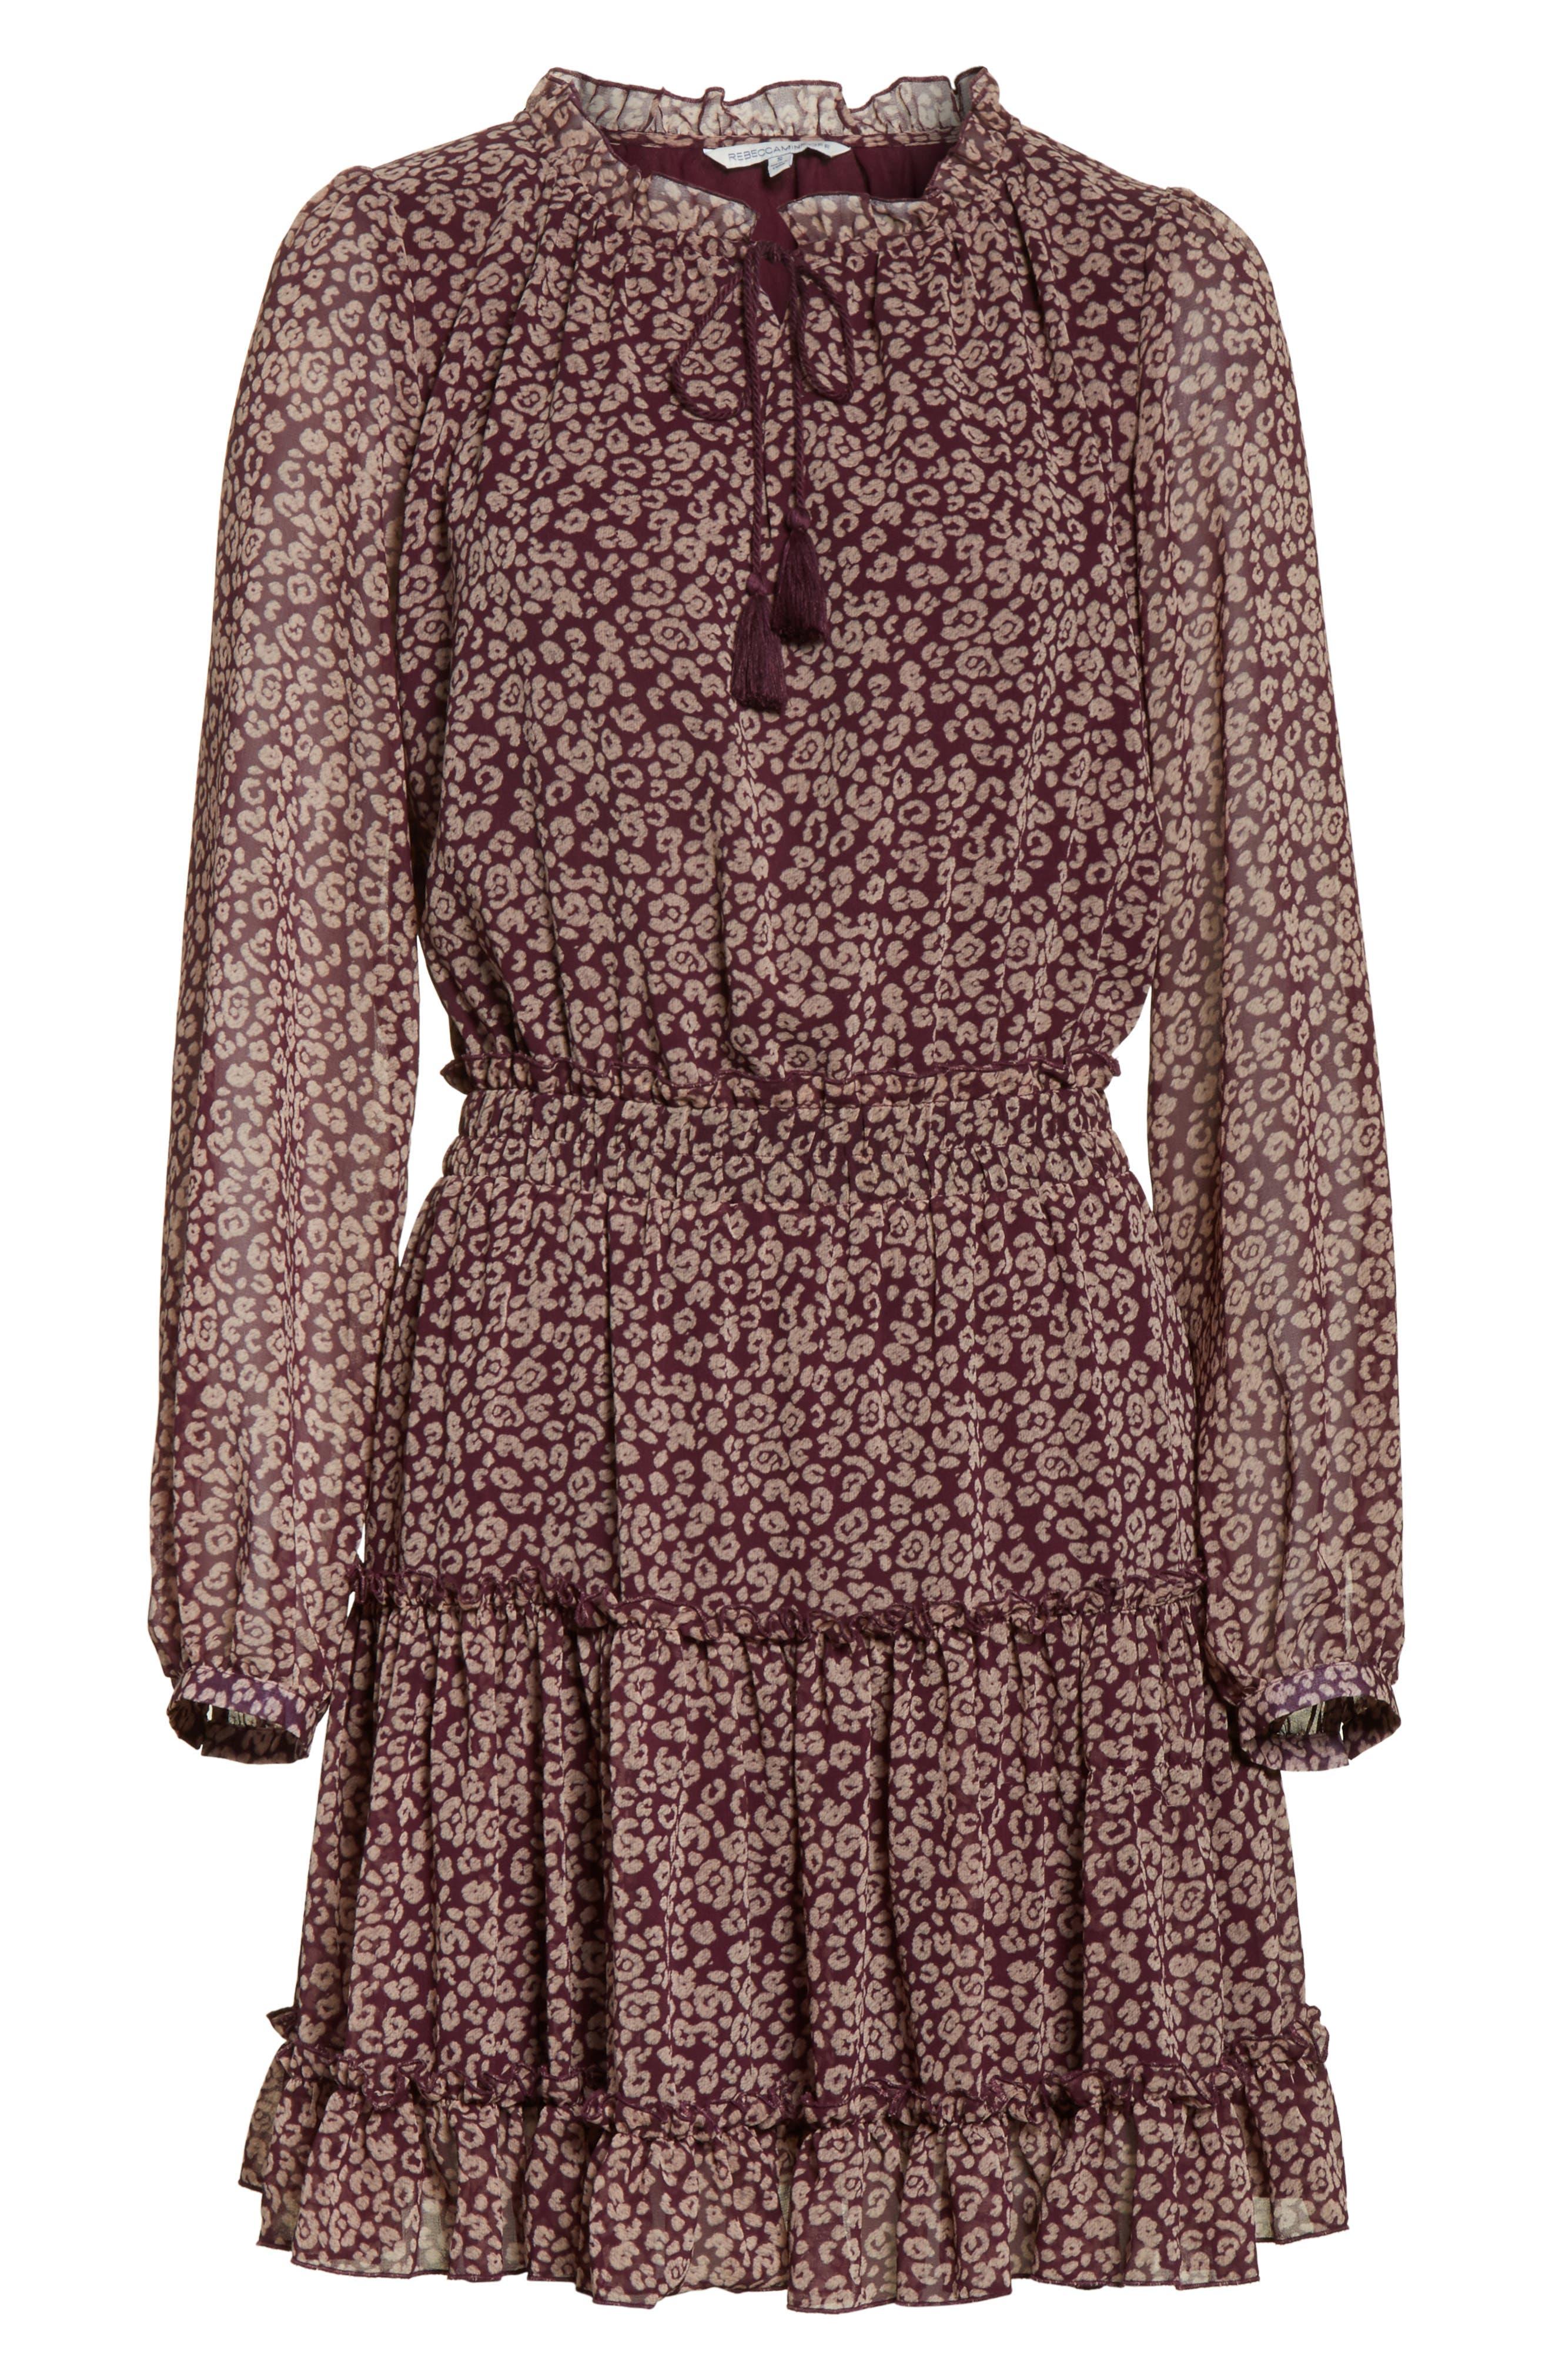 Rosemary A-Line Dress,                             Alternate thumbnail 6, color,                             Potent Purple Leopard